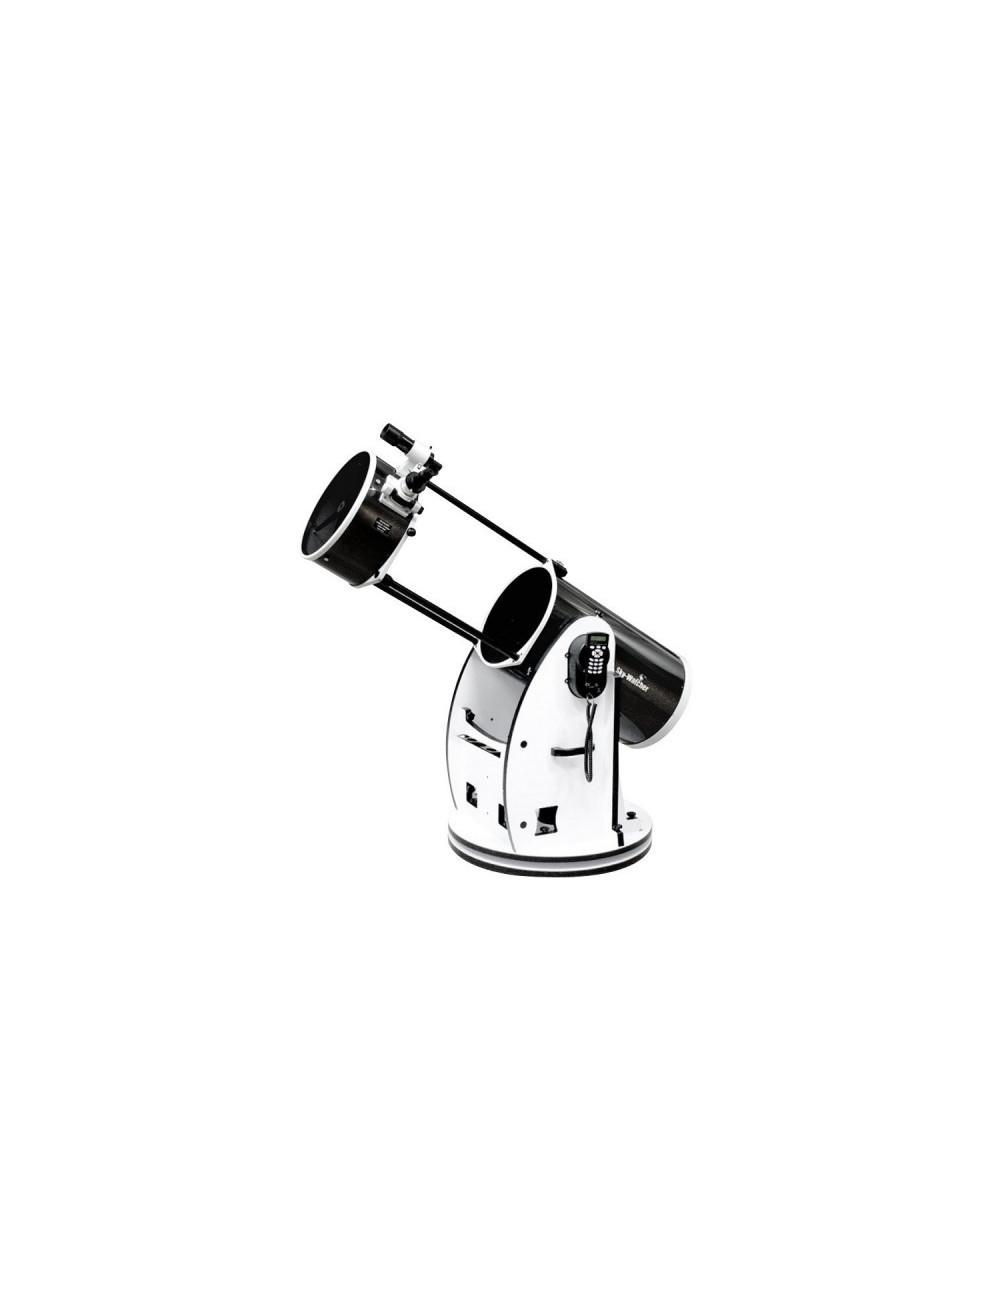 Telescope Dobson FlexTube GoTo 350/1600 Sky-Watcher